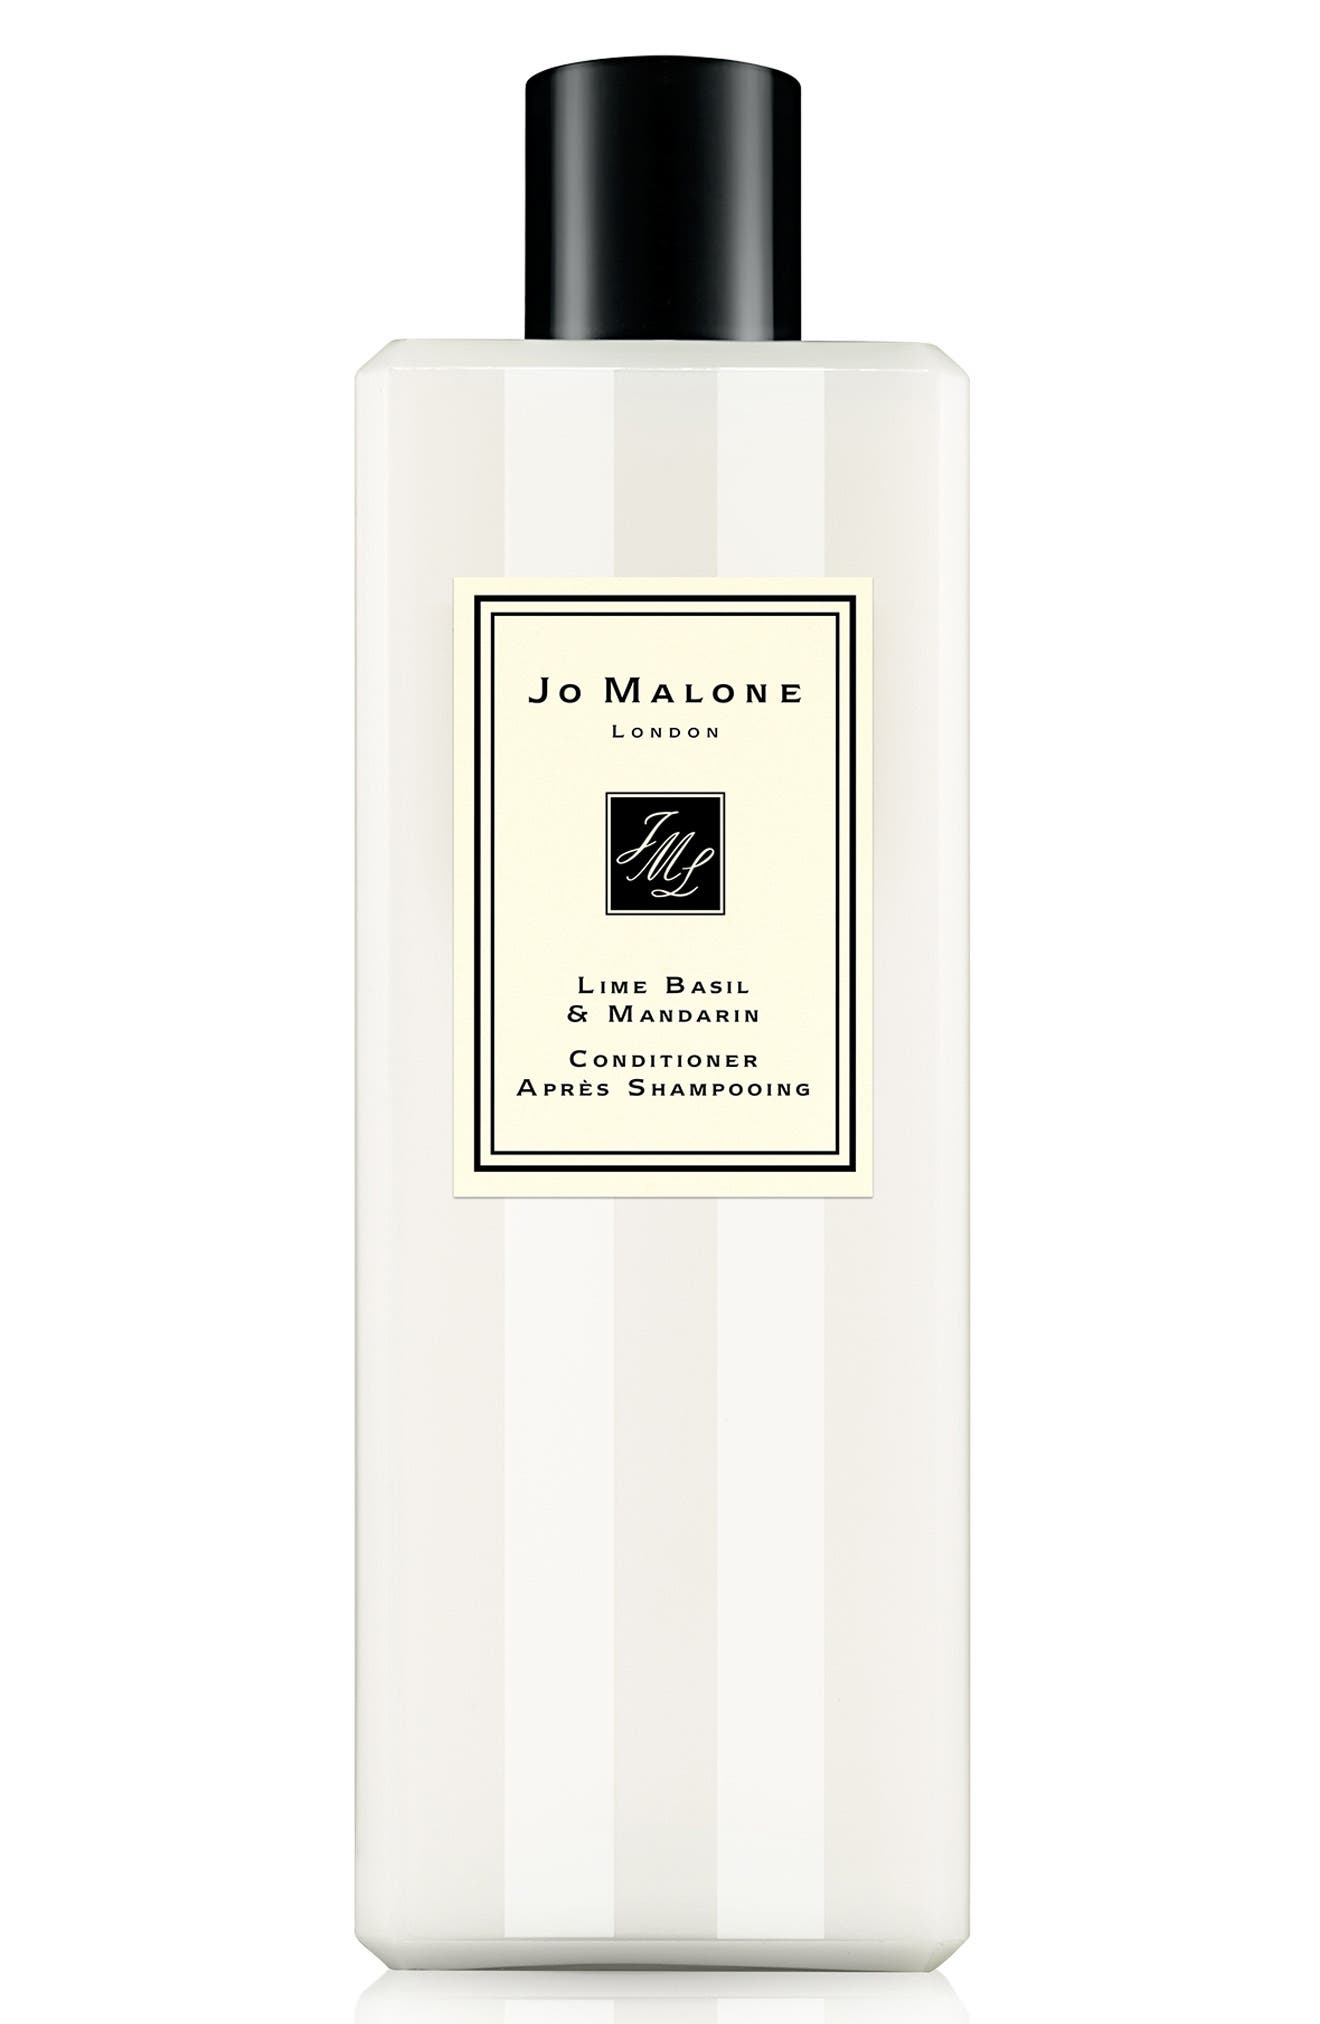 Alternate Image 1 Selected - Jo Malone London™ 'Lime Basil & Mandarin' Conditioner